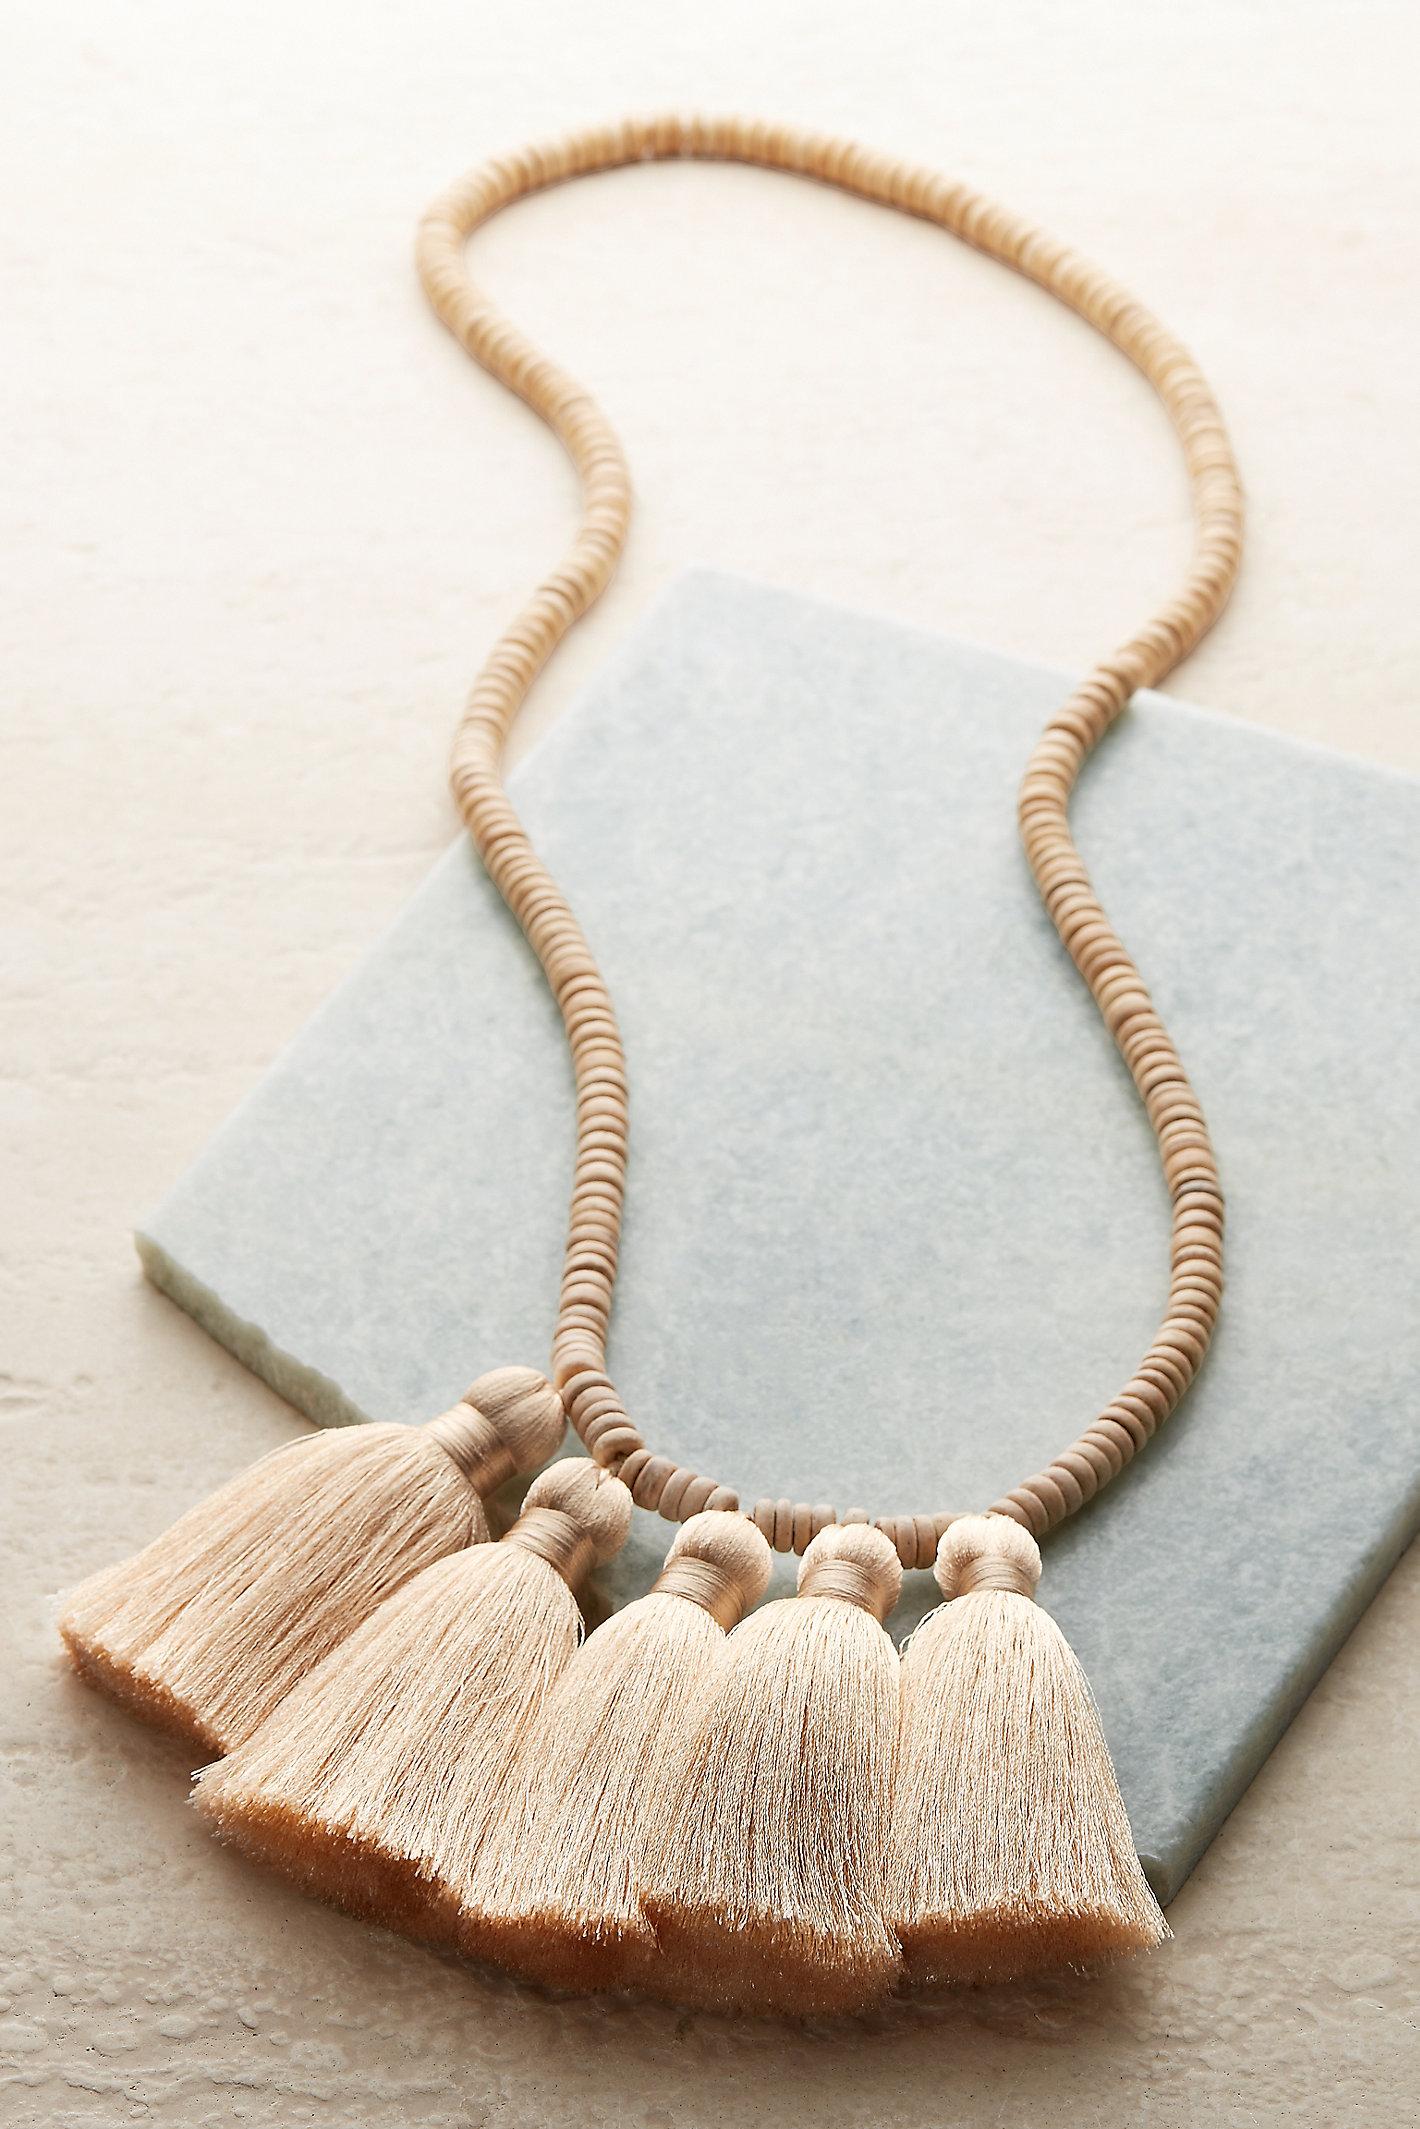 Desert Dreams Necklace